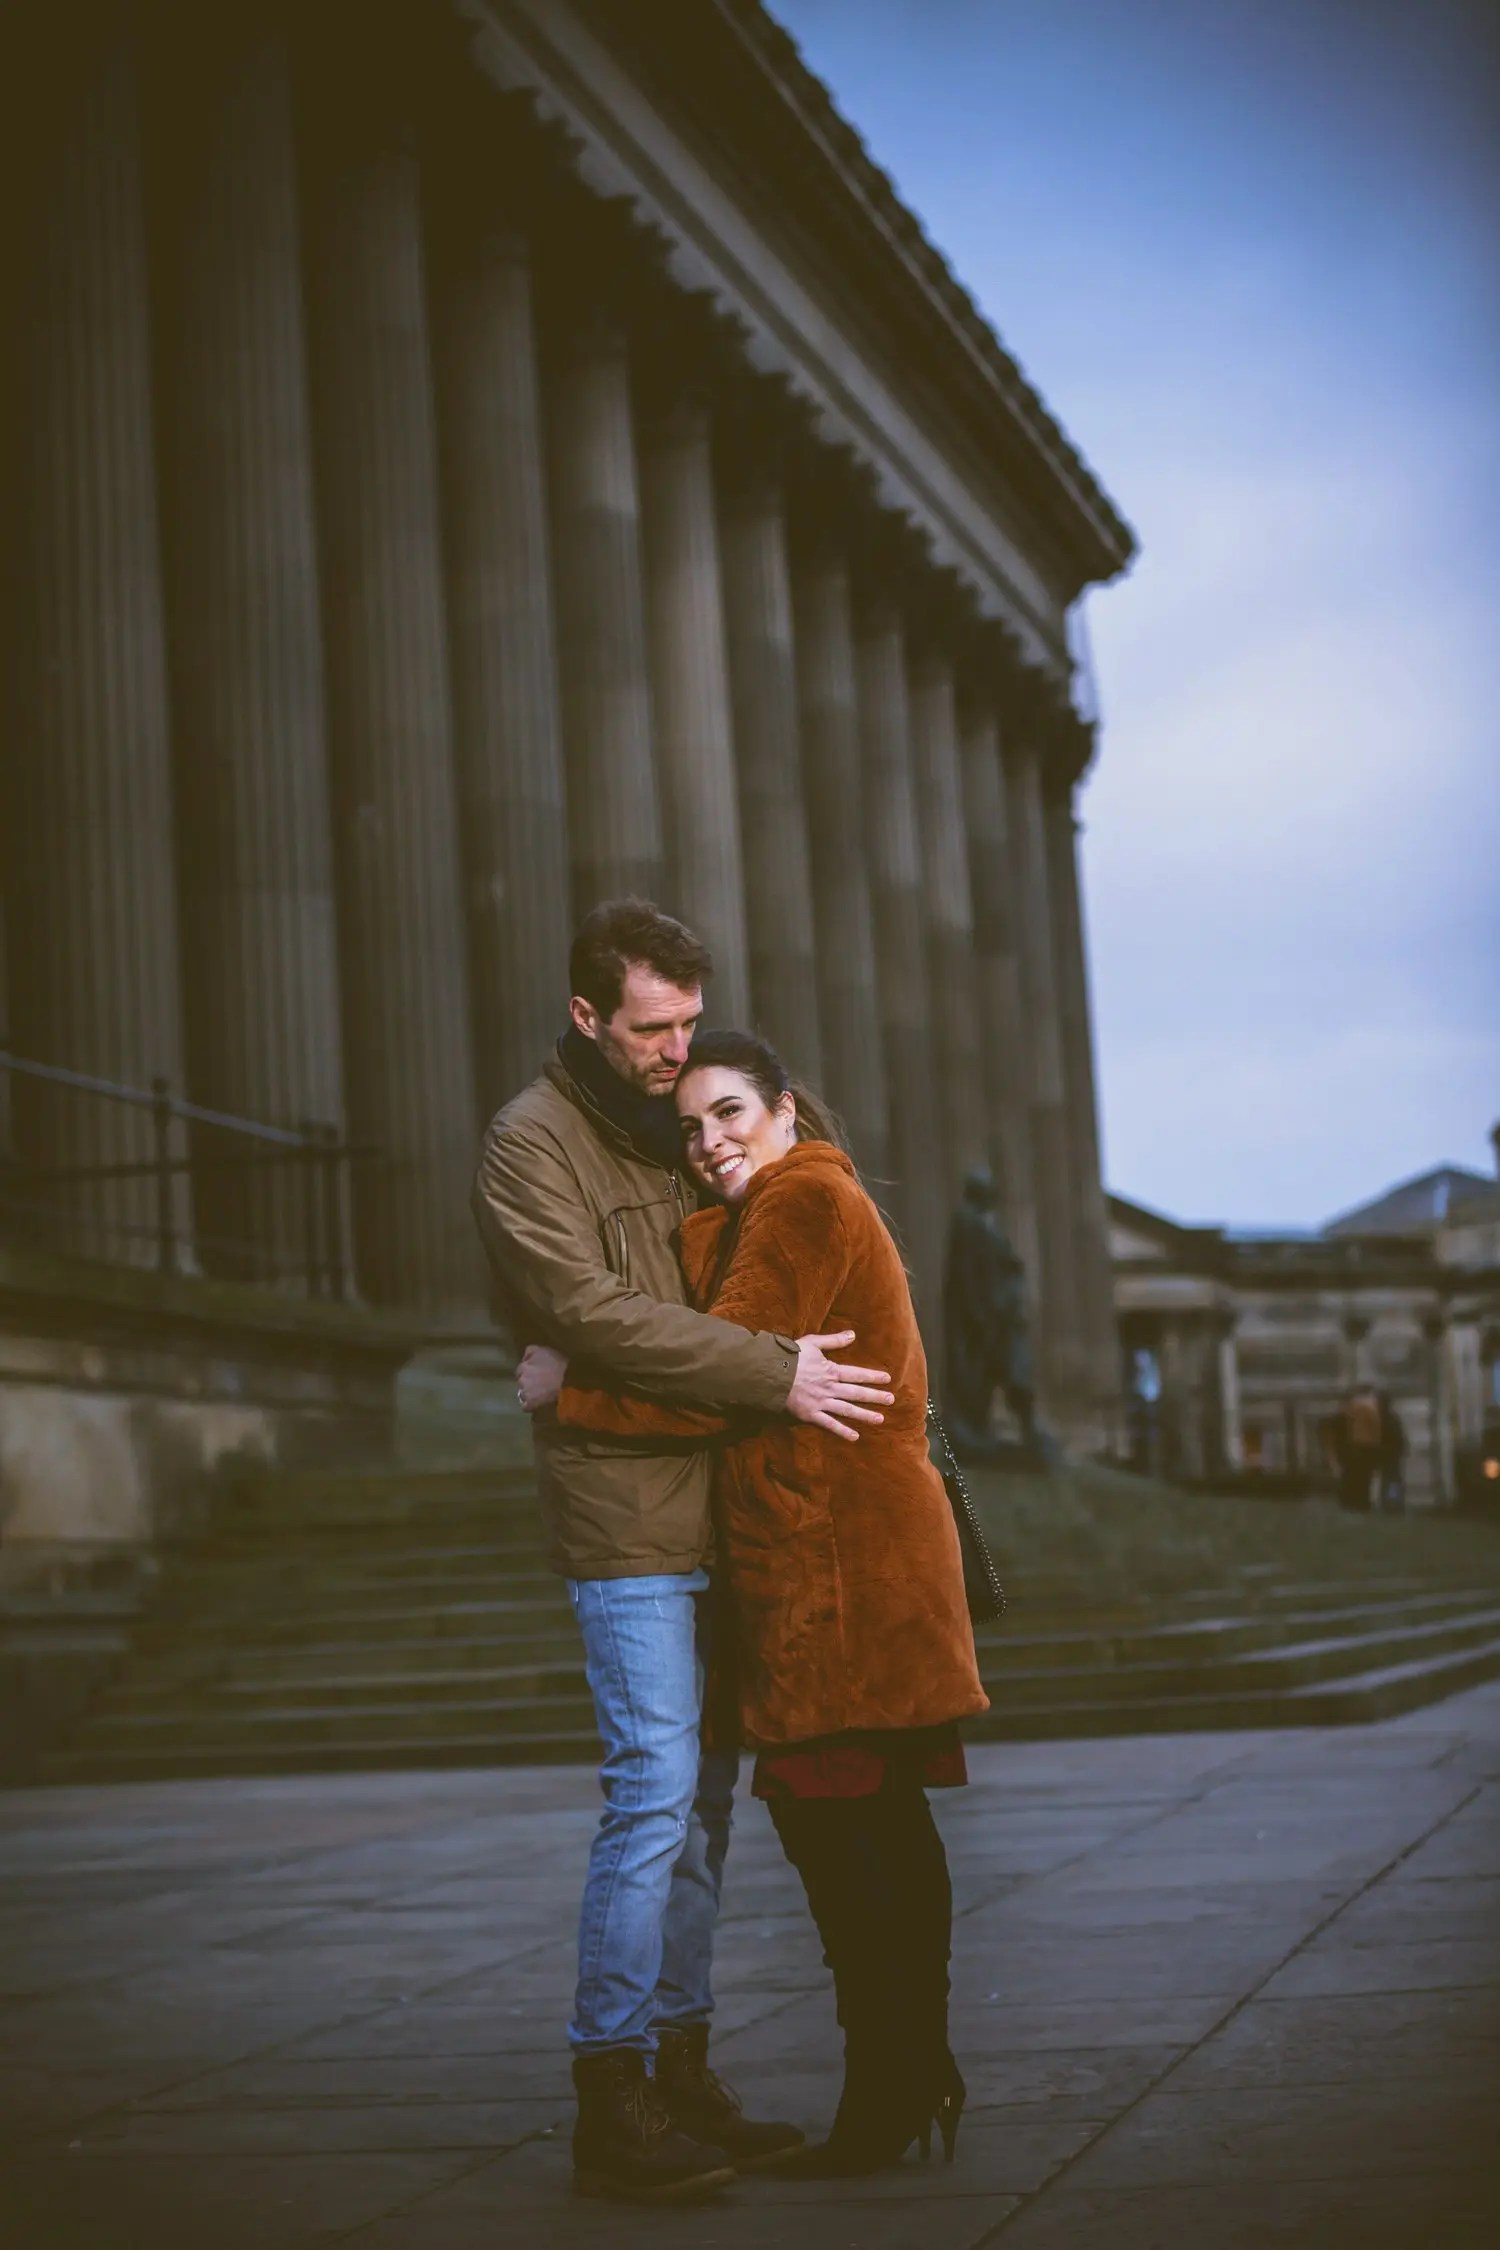 Liverpool Pre-wedding photo shoot